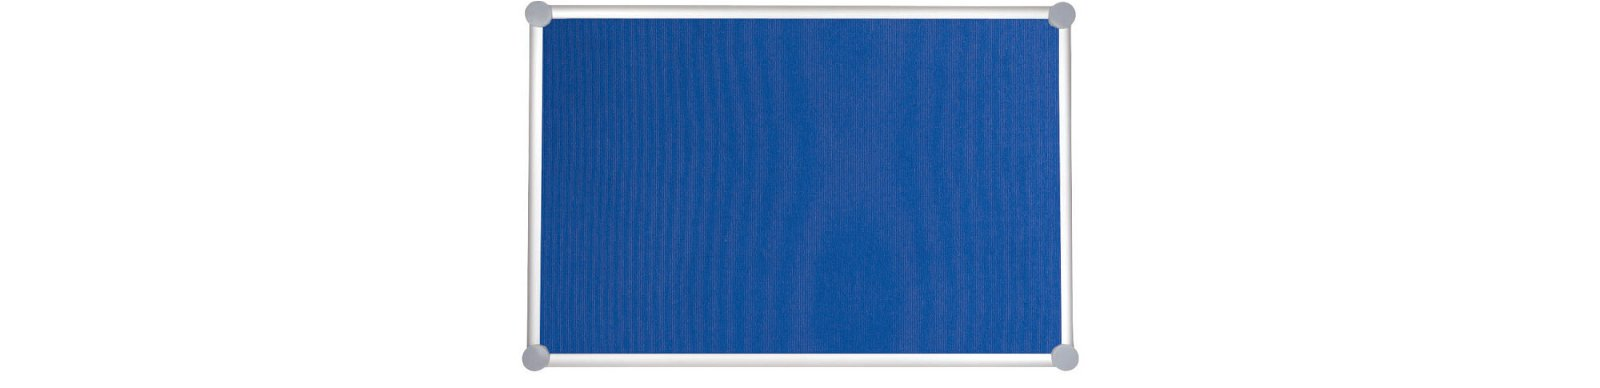 Pinnboard 2000 MAULpro, Textil, 100x150 cm, blau